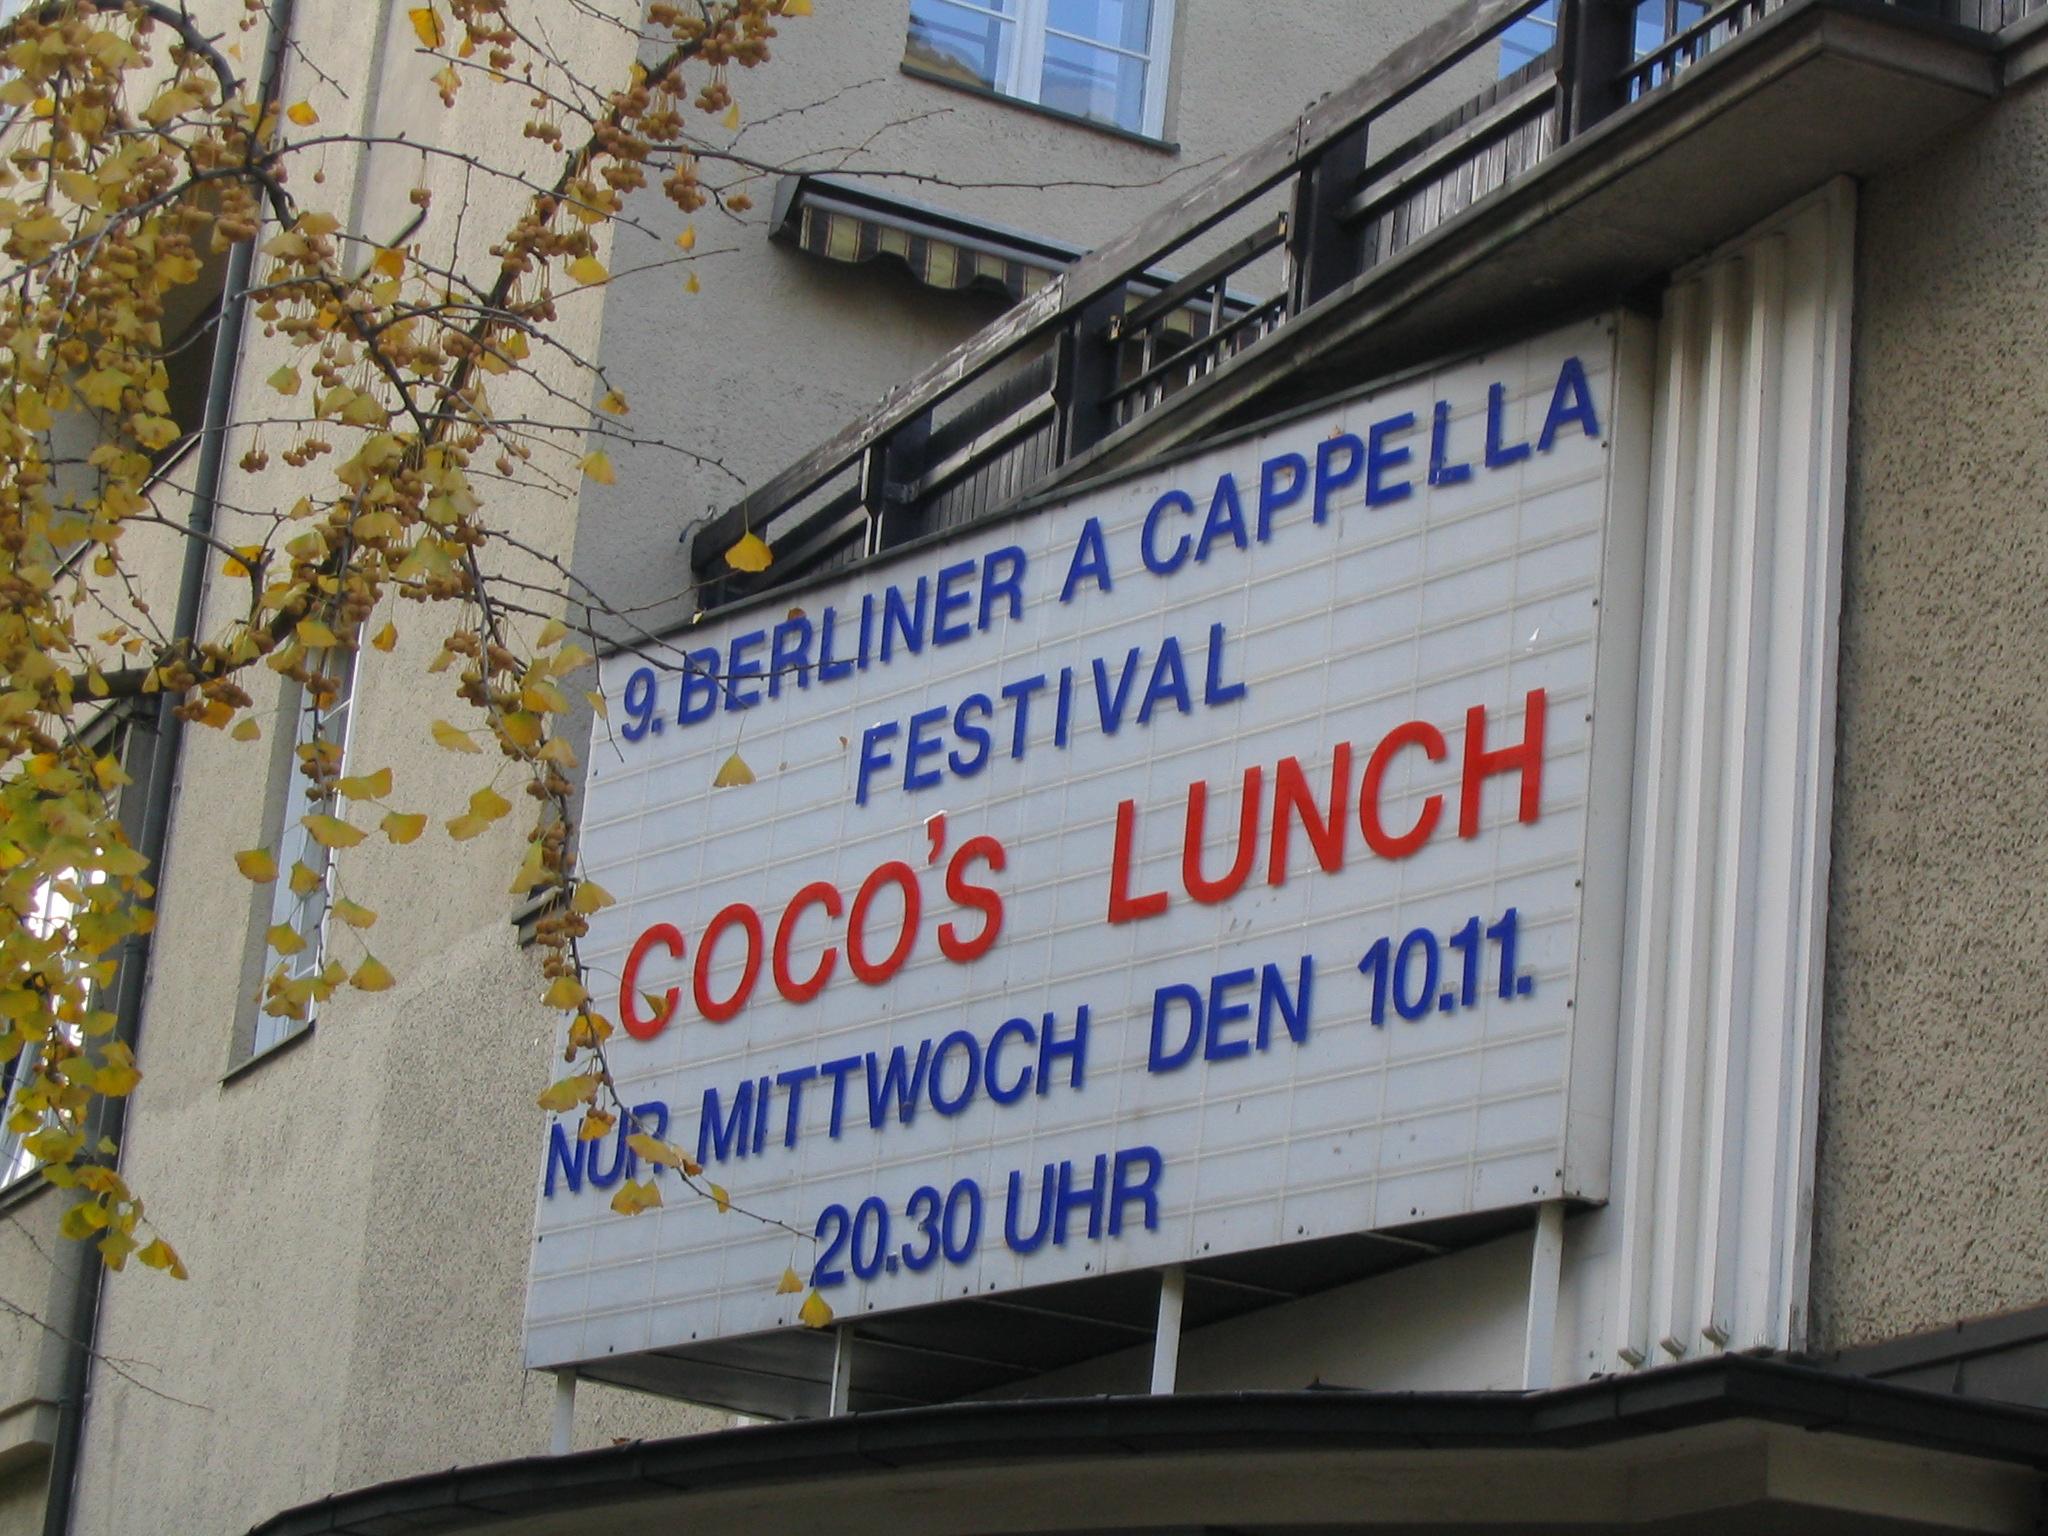 Berliner A Cappella Festival